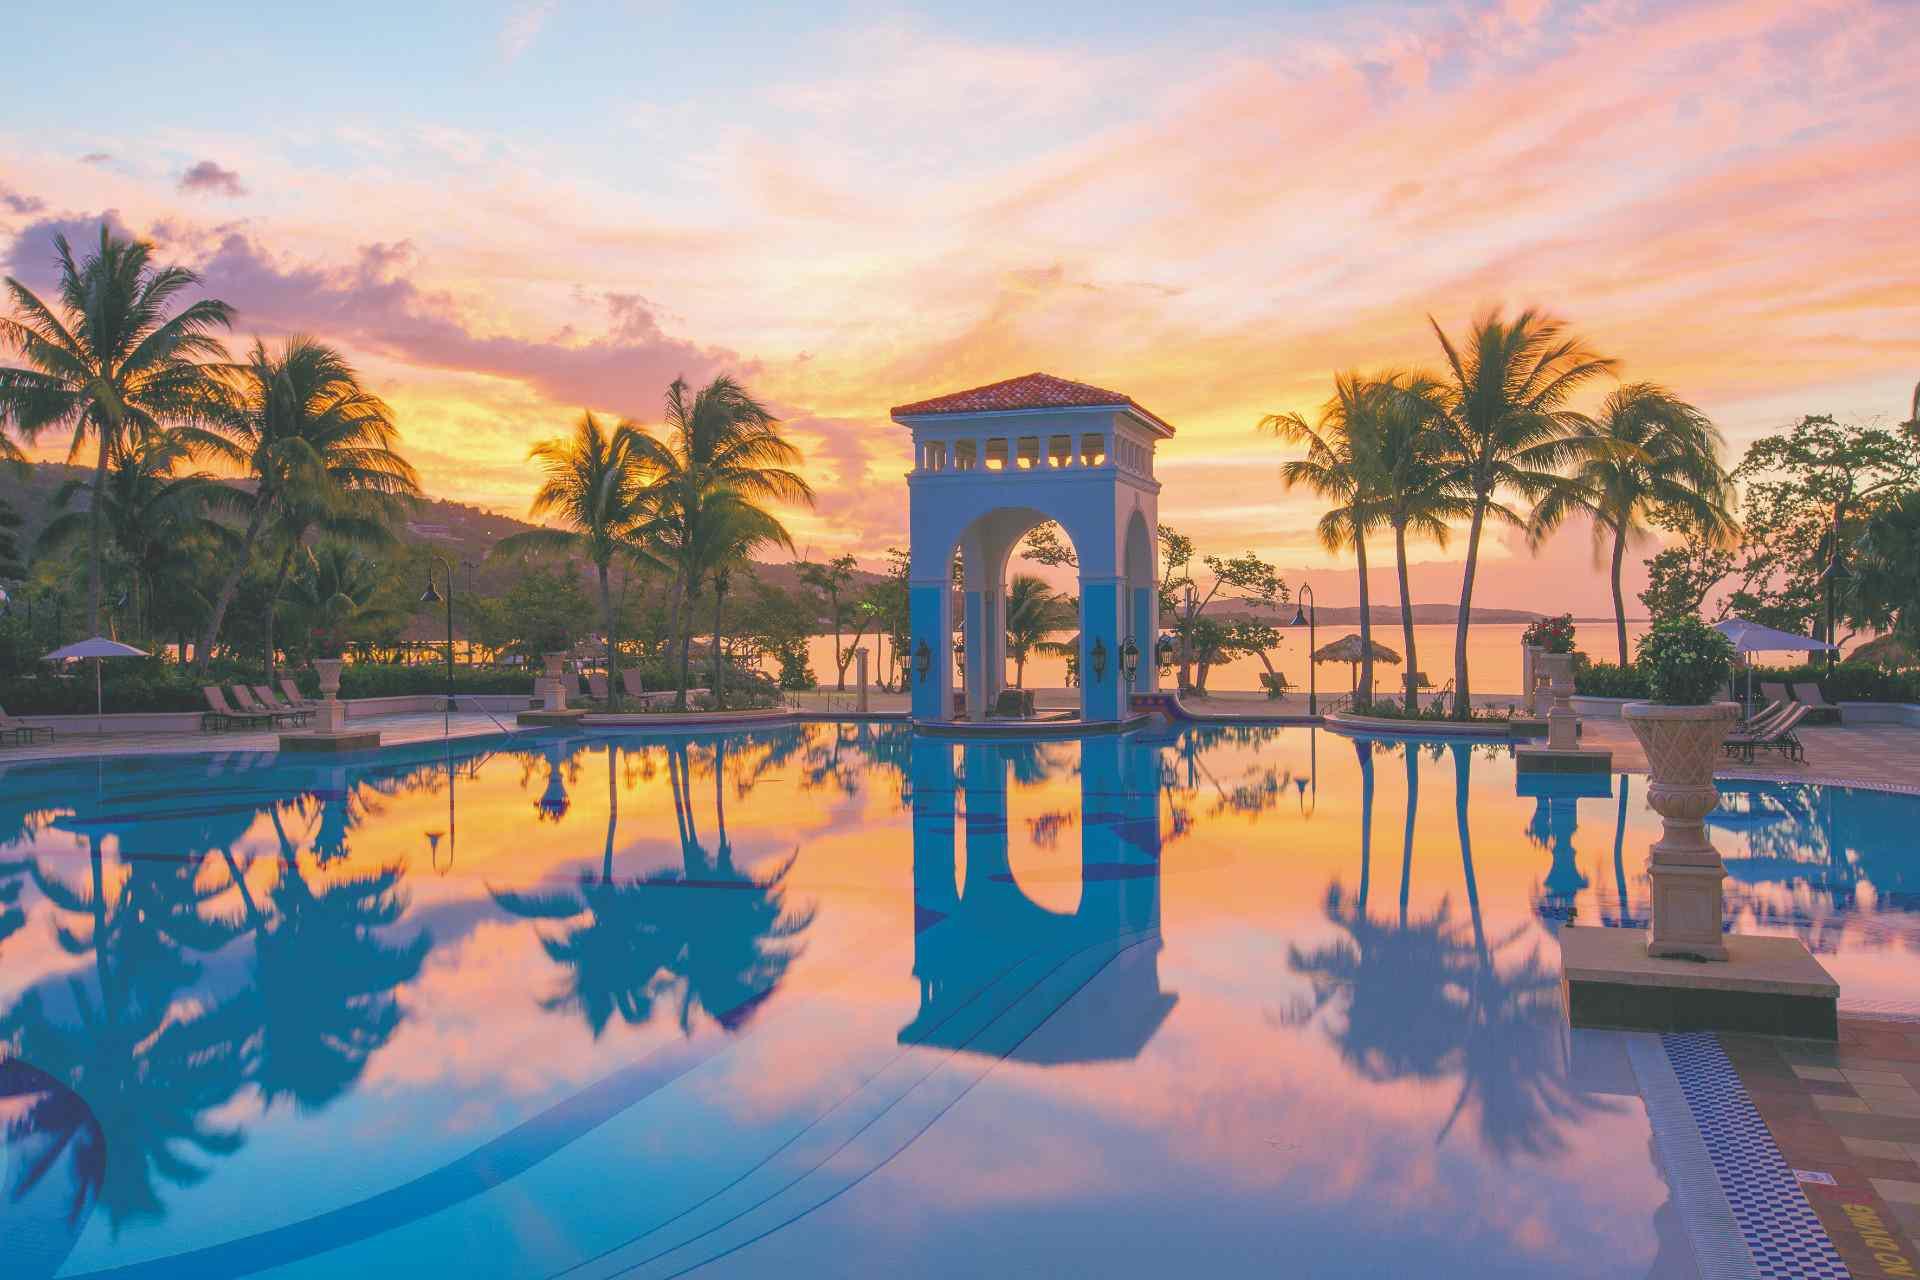 Sandals South Coast – Whitehouse, Jamaica